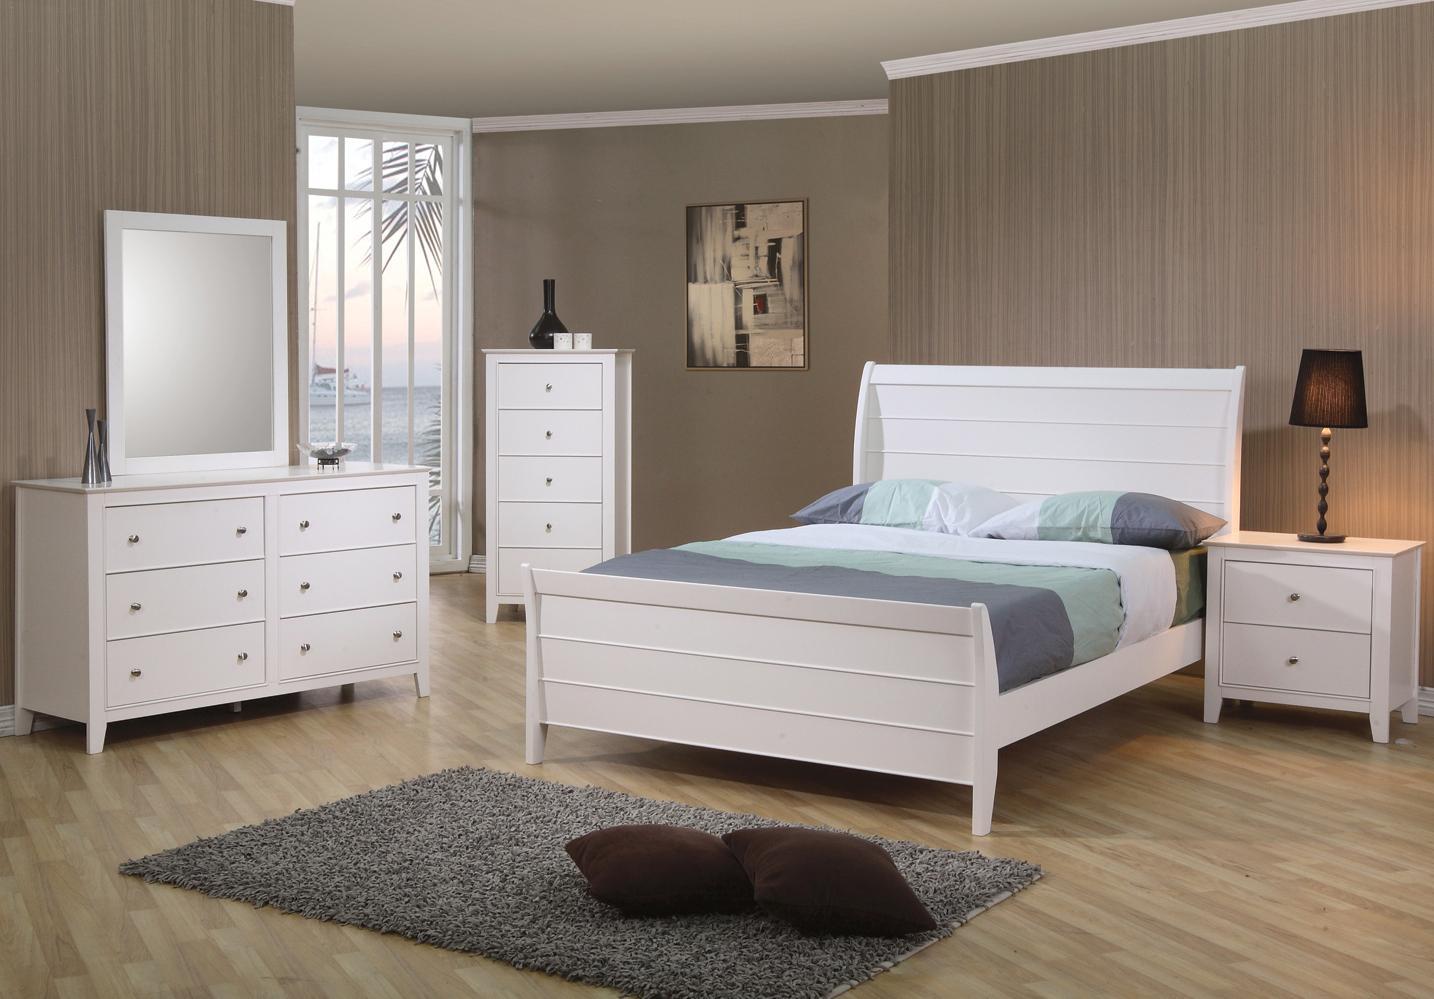 coaster selena 6 drawer dresser & landscape mirror - coaster fine